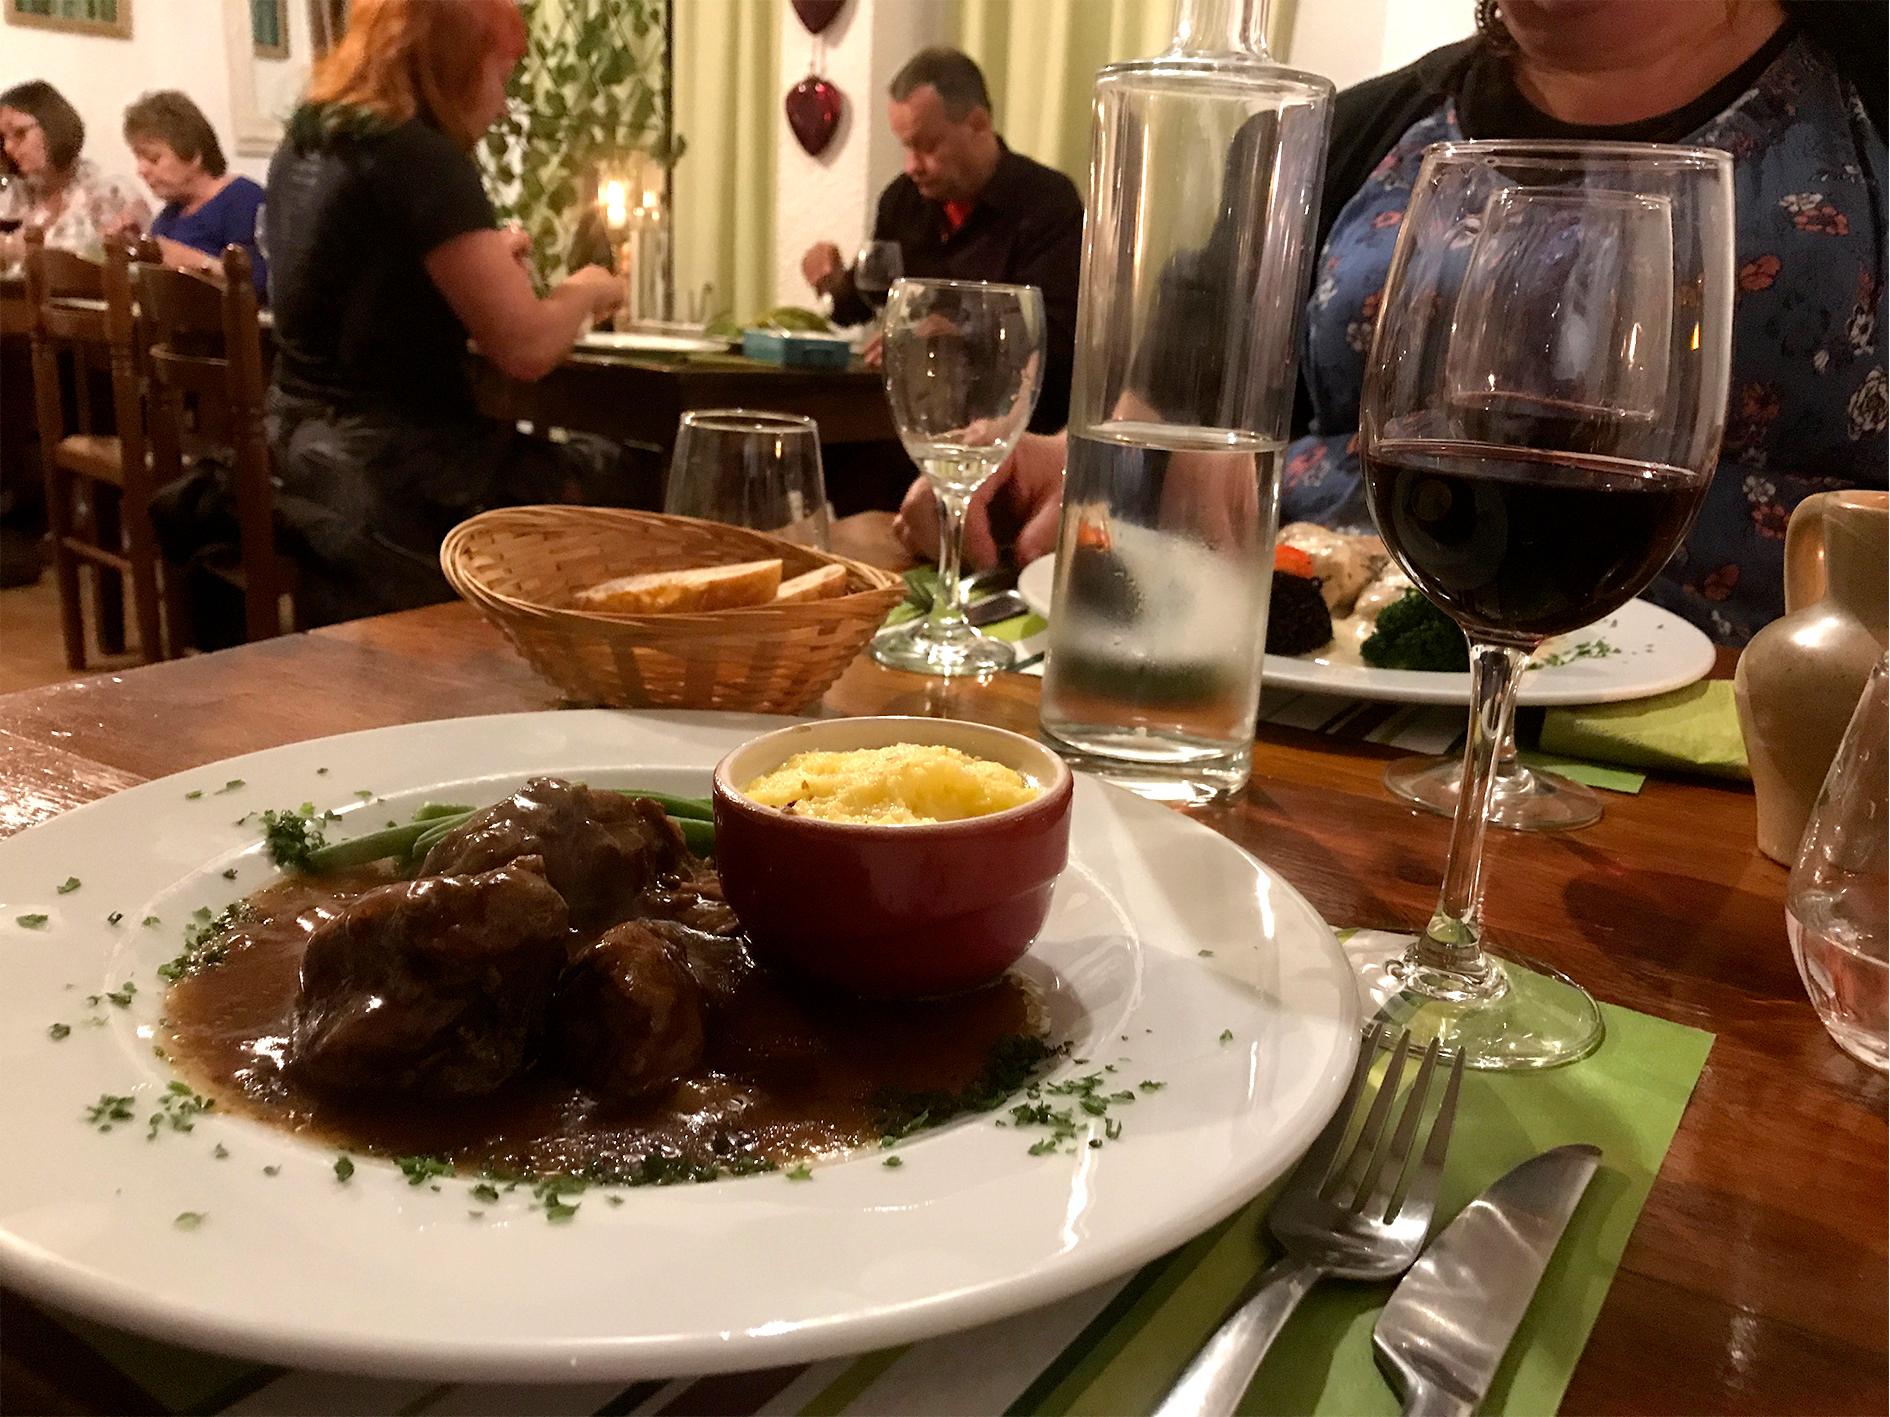 Hotel og Restaurant Axat - bord og mennesker, vinglas og mad